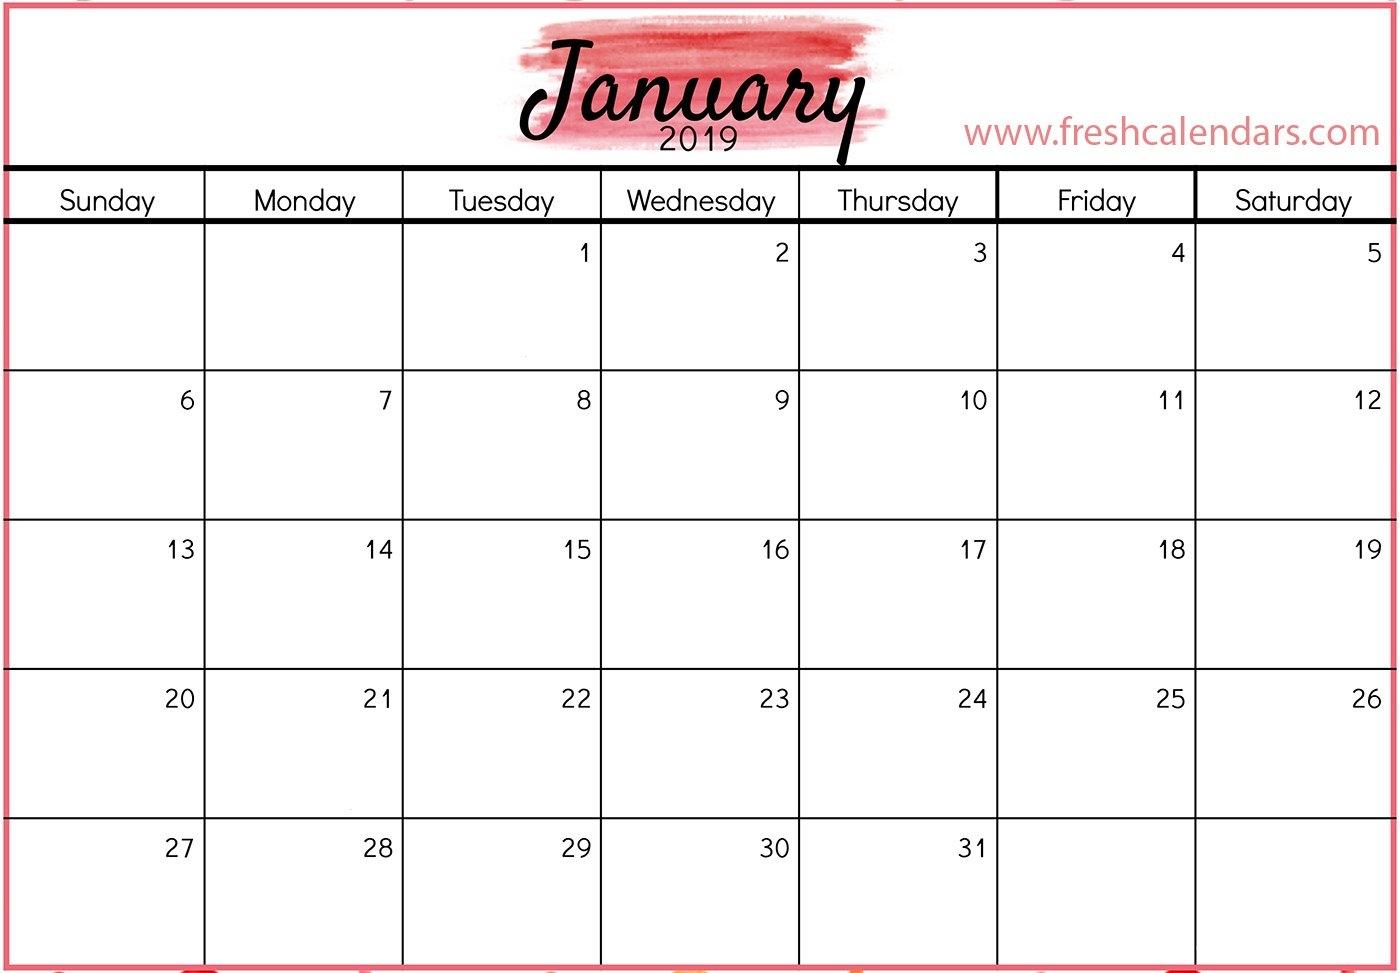 January 2019 Printable Calendars – Fresh Calendars Calendar 2019 January